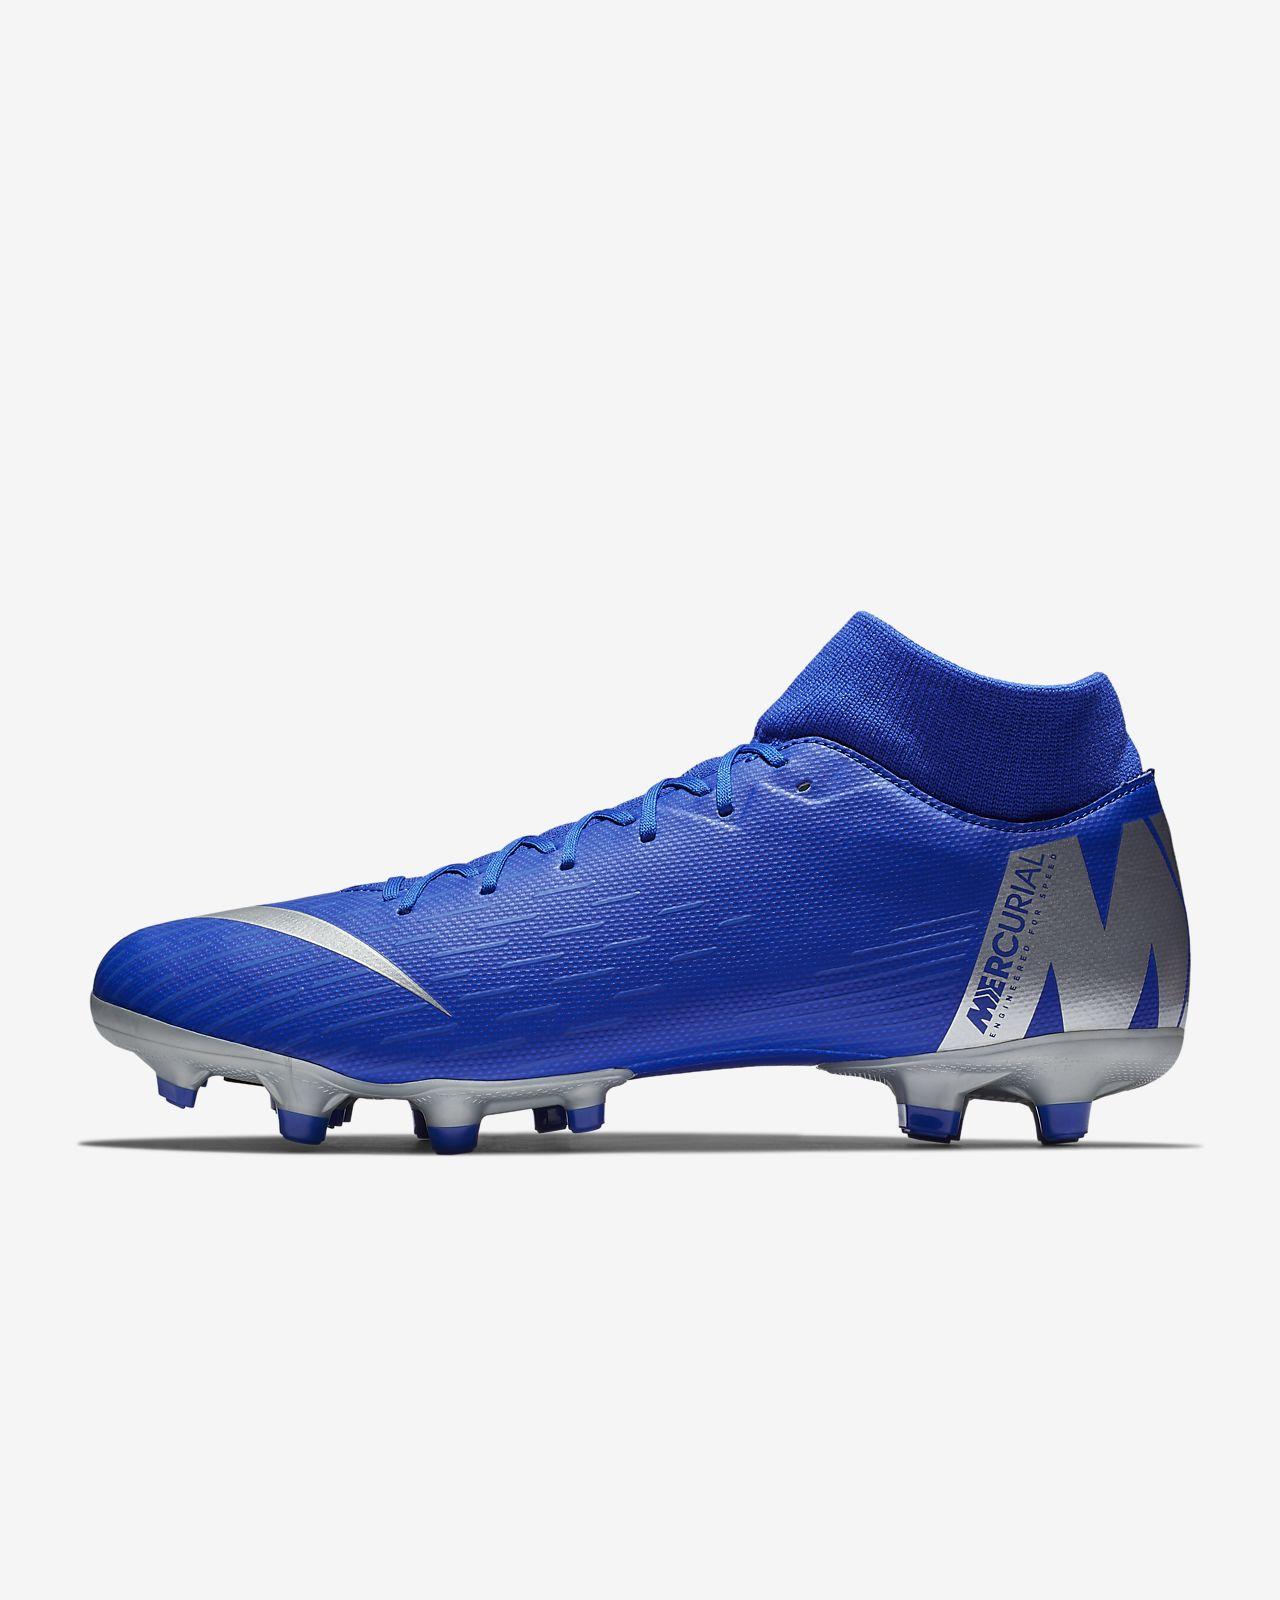 af35d2bd44 ... hot scarpa da calcio multiterreno nike mercurial superfly 6 academy mg  fda14 d6617